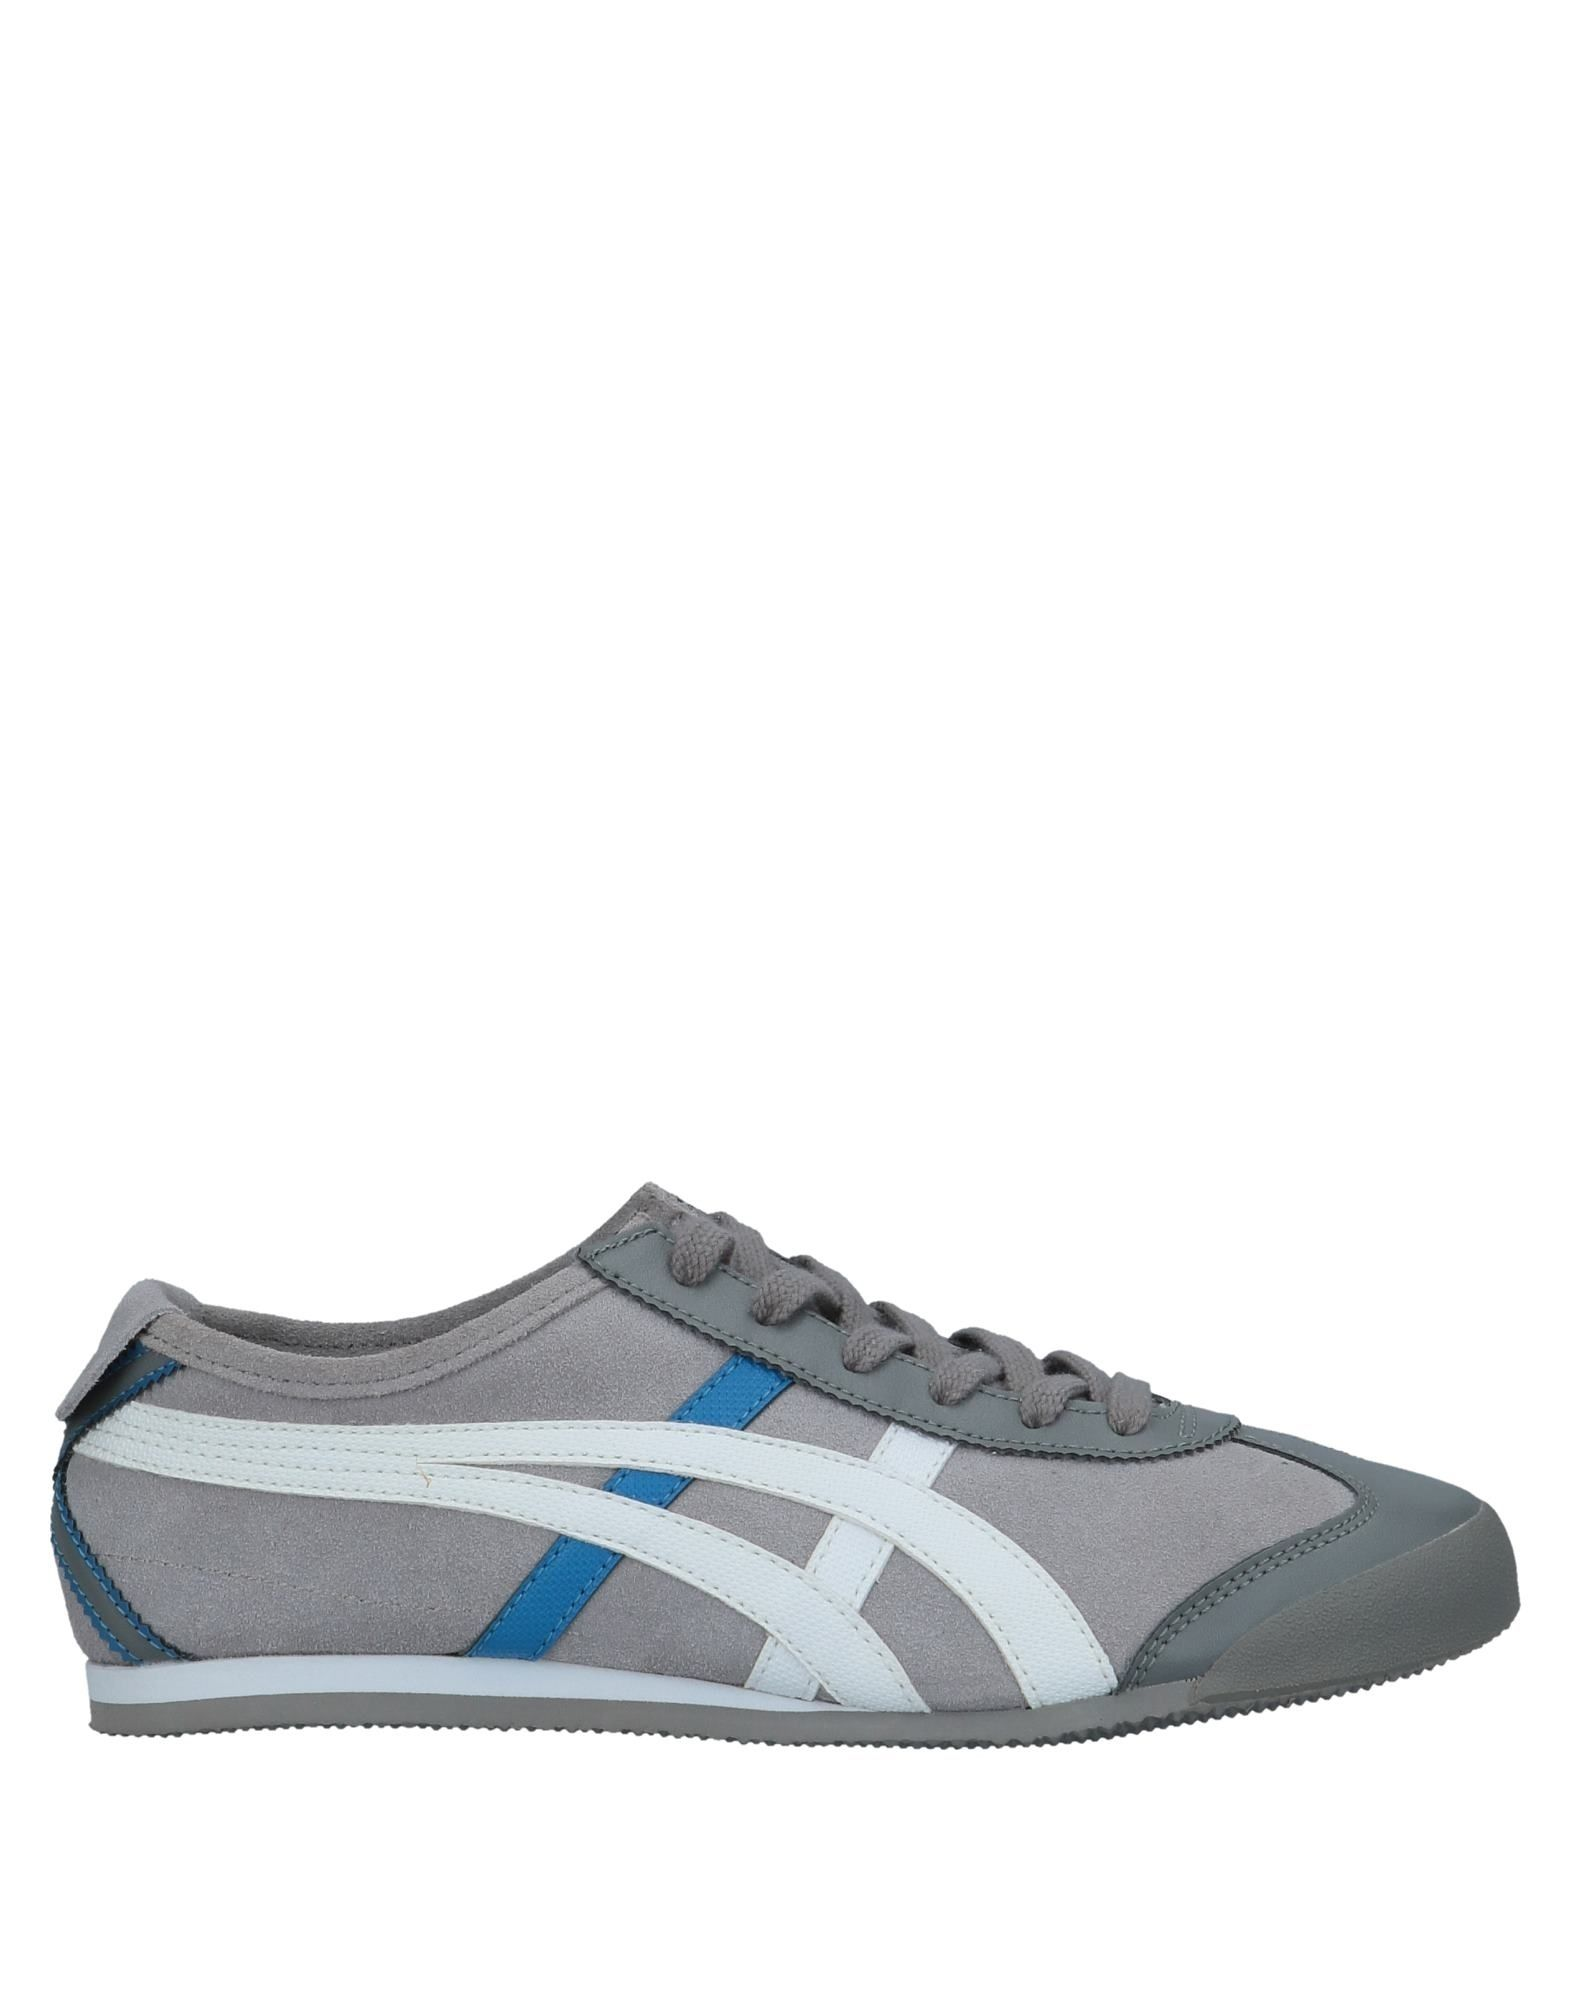 Rabatt echte Schuhe Onitsuka 44845147DB Tiger Sneakers Herren  44845147DB Onitsuka 40551e